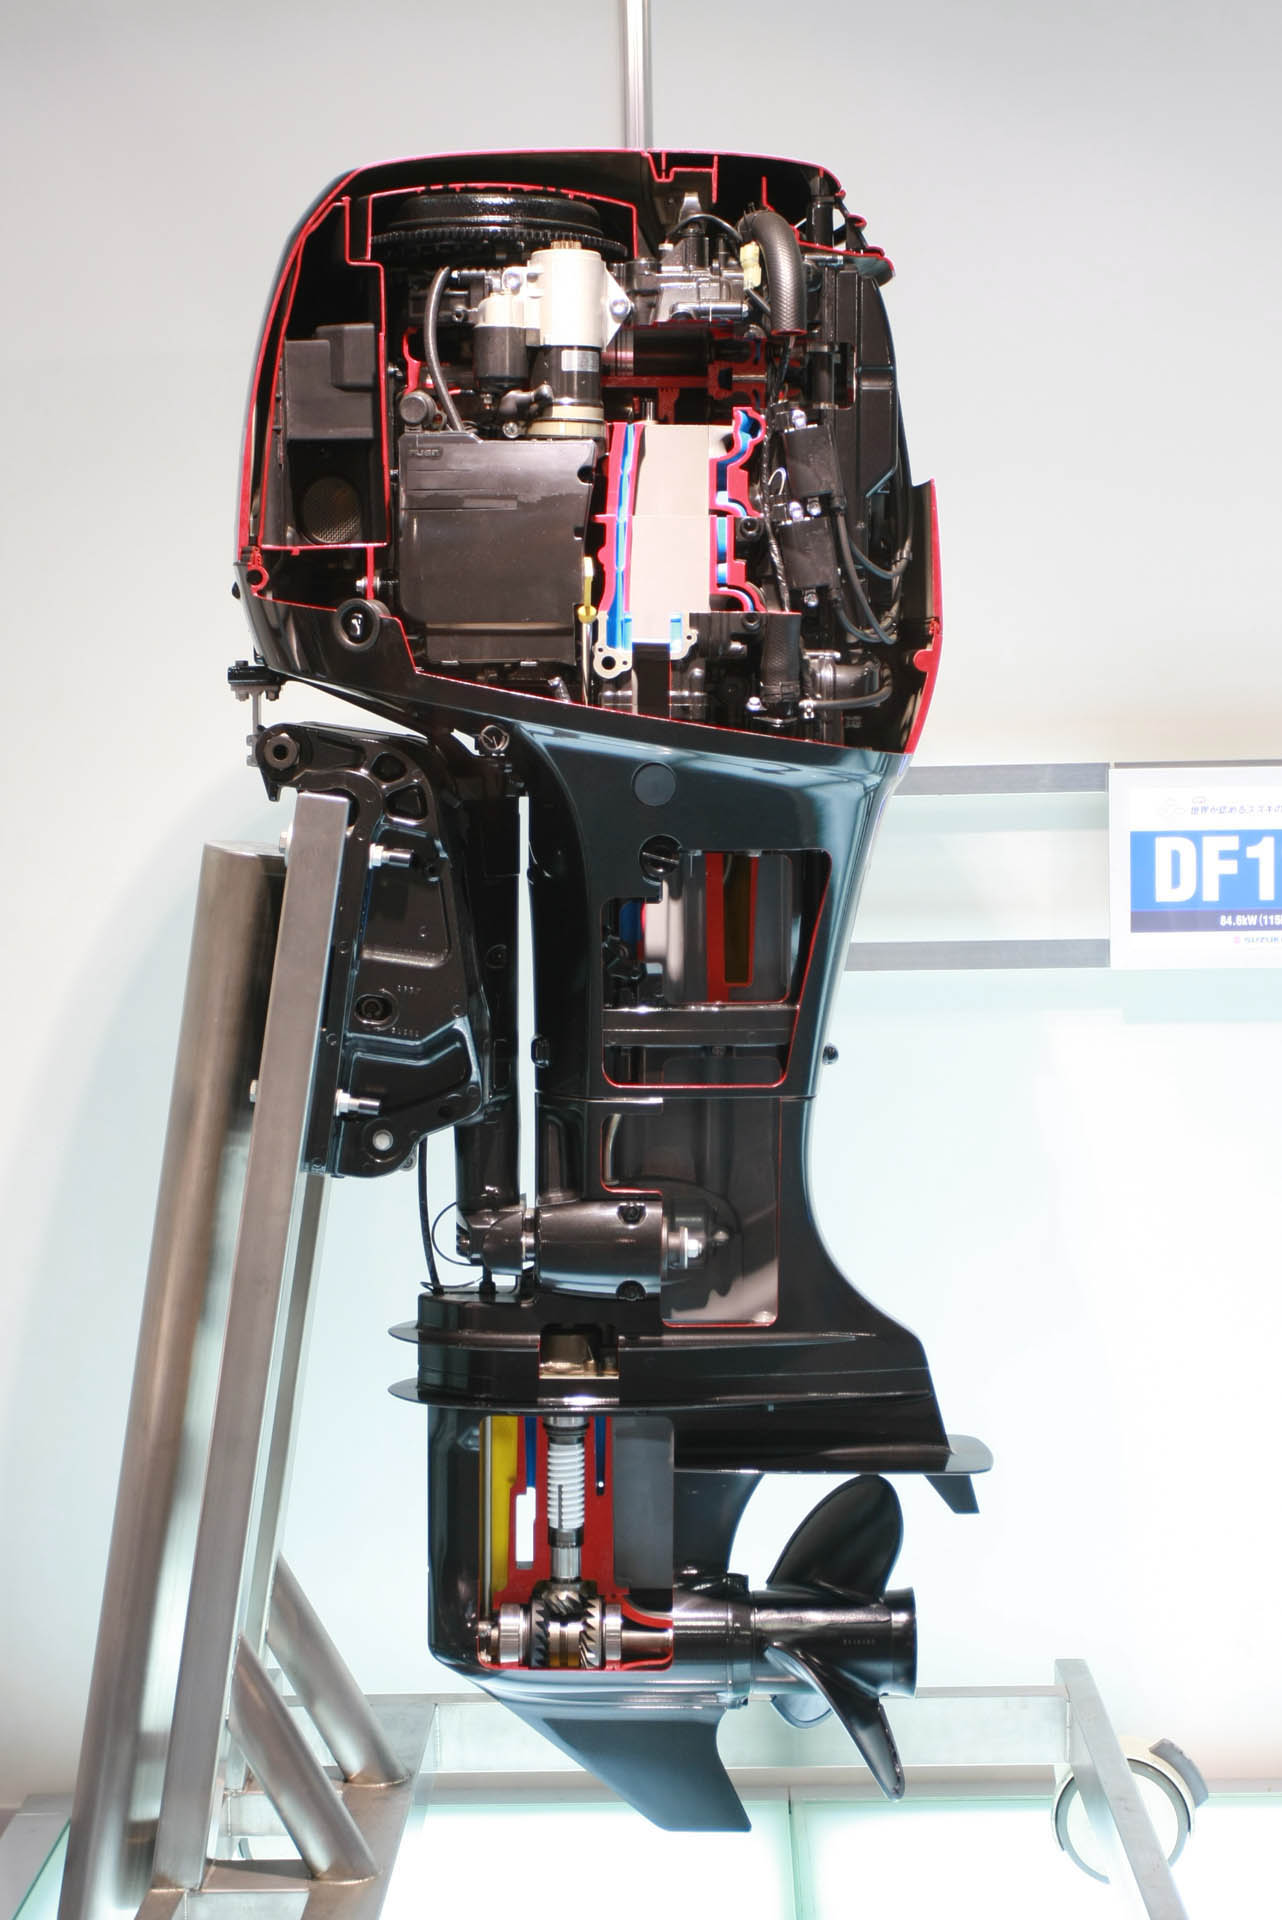 Yamaha Outboard Fuel Connector